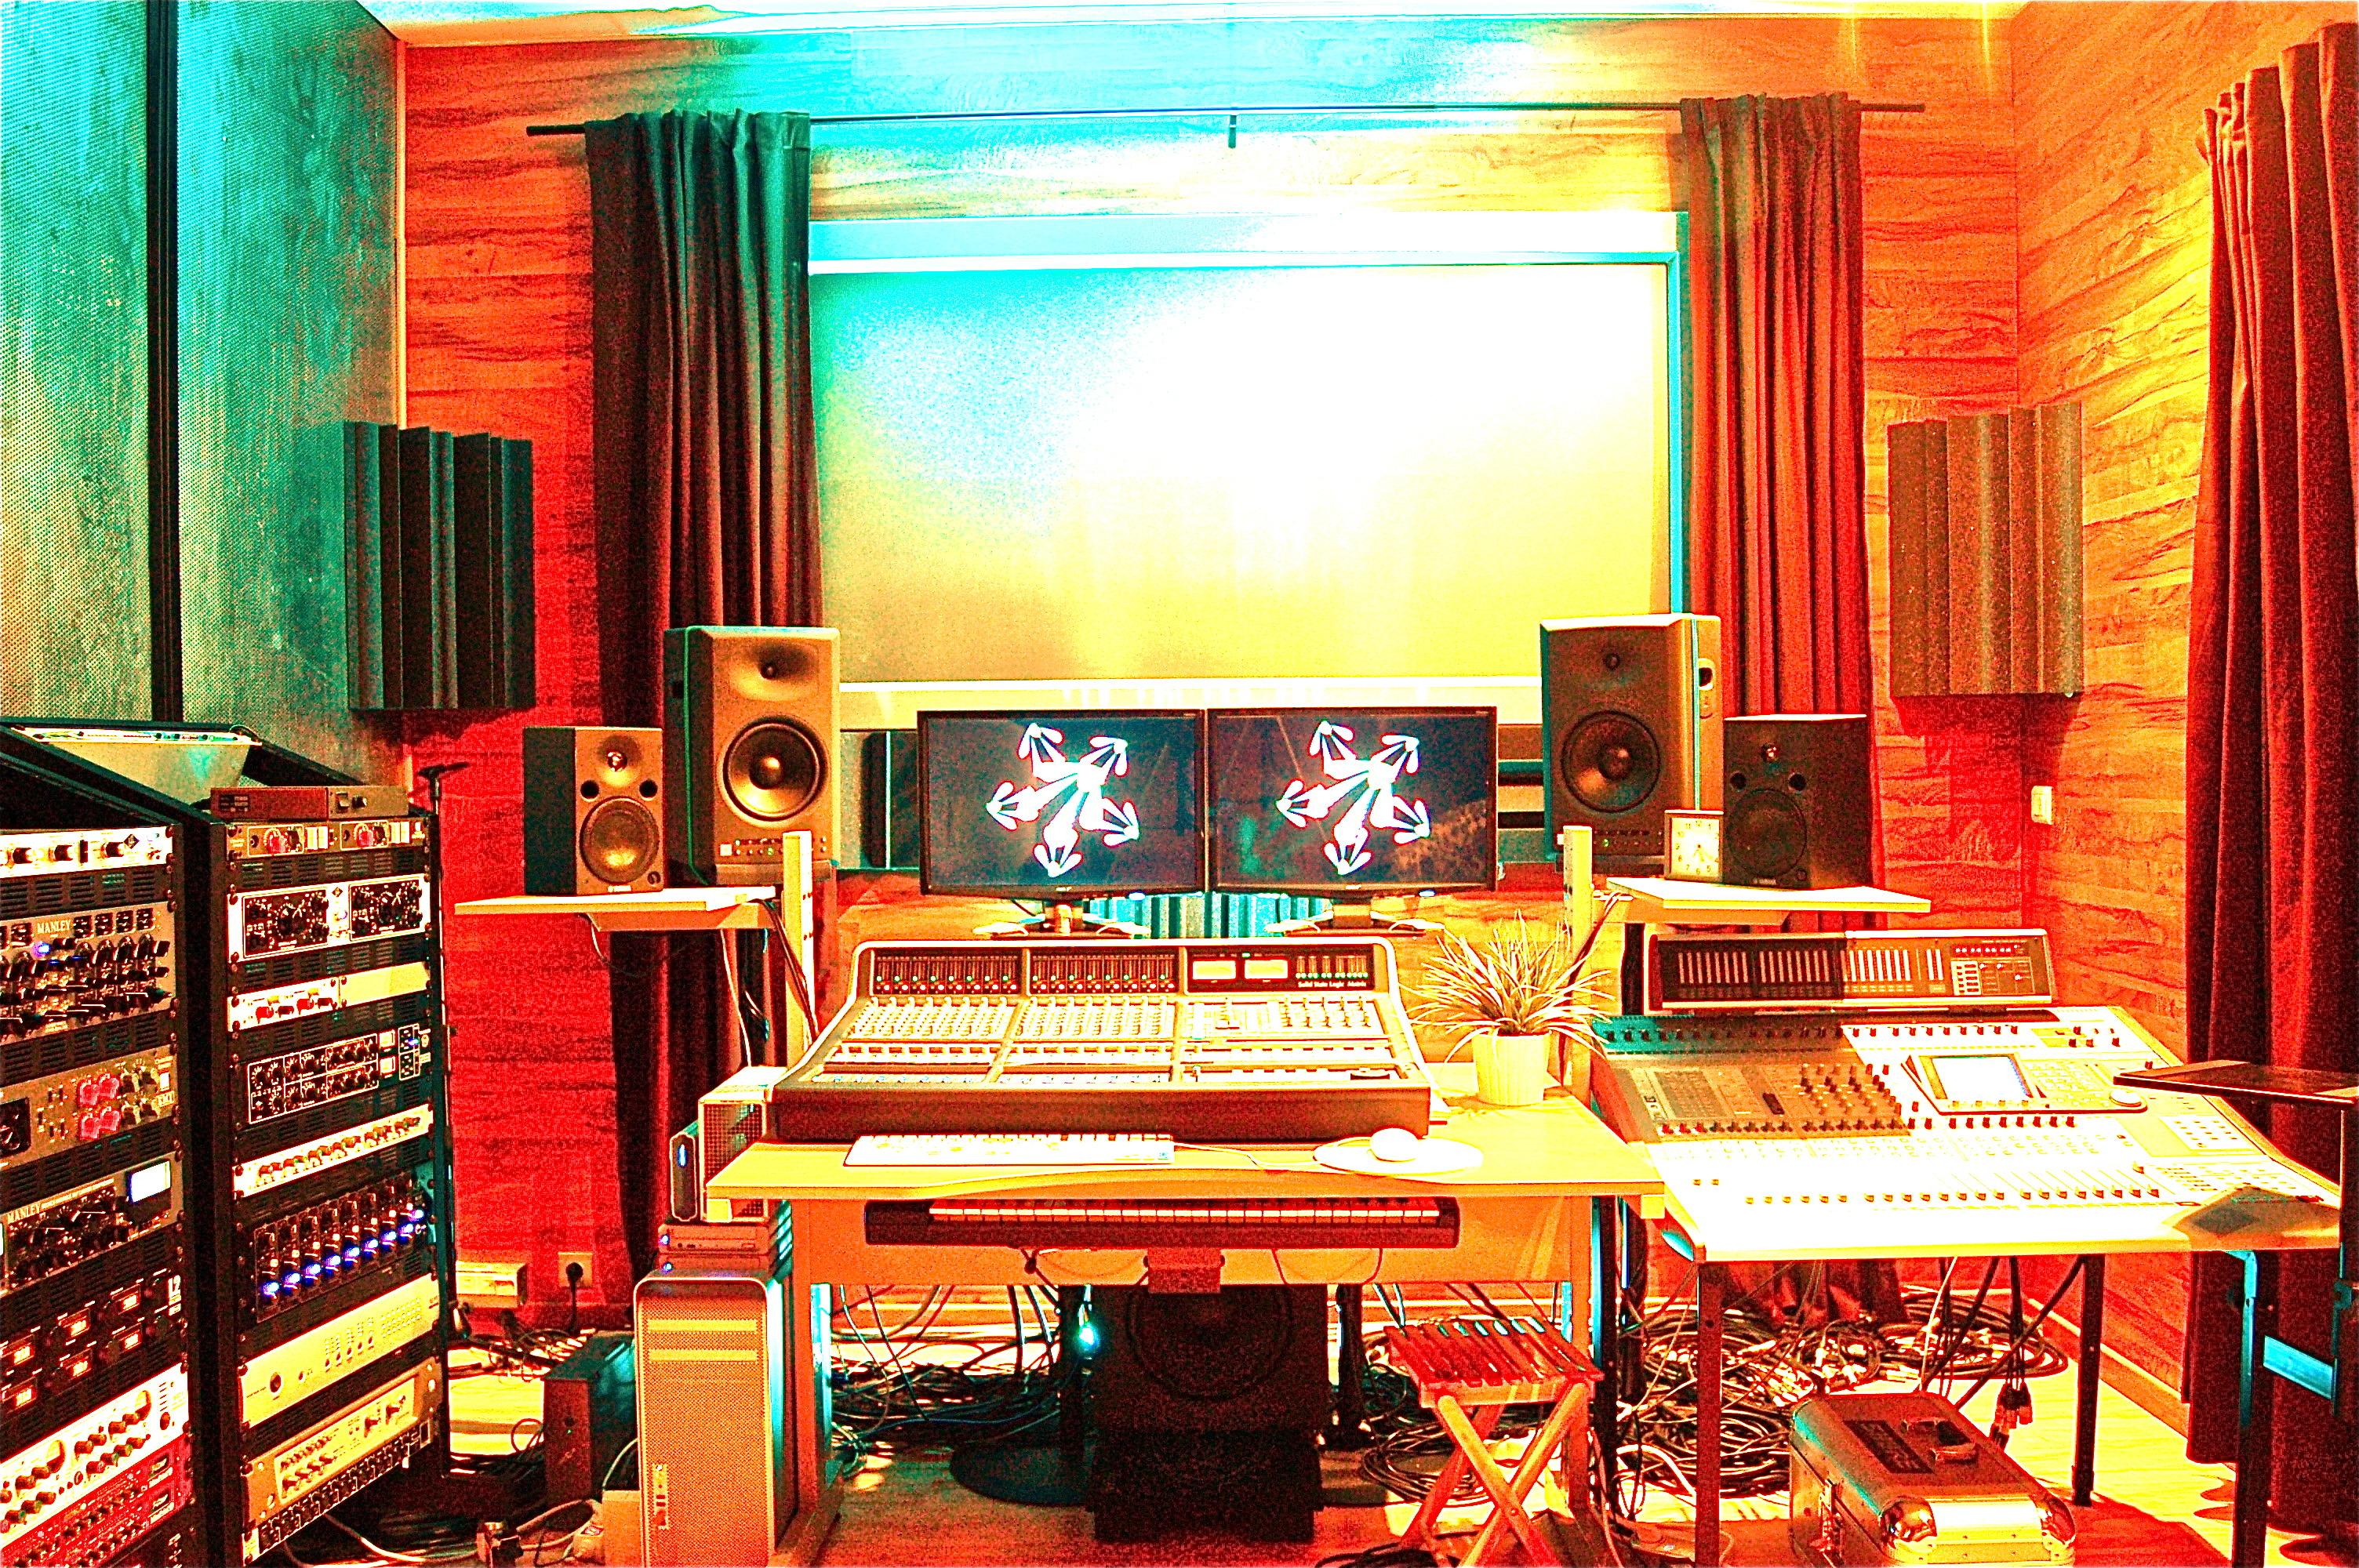 Studio d 39 enregistrement mixage et mastering roubaix - Table de mixage studio d enregistrement ...